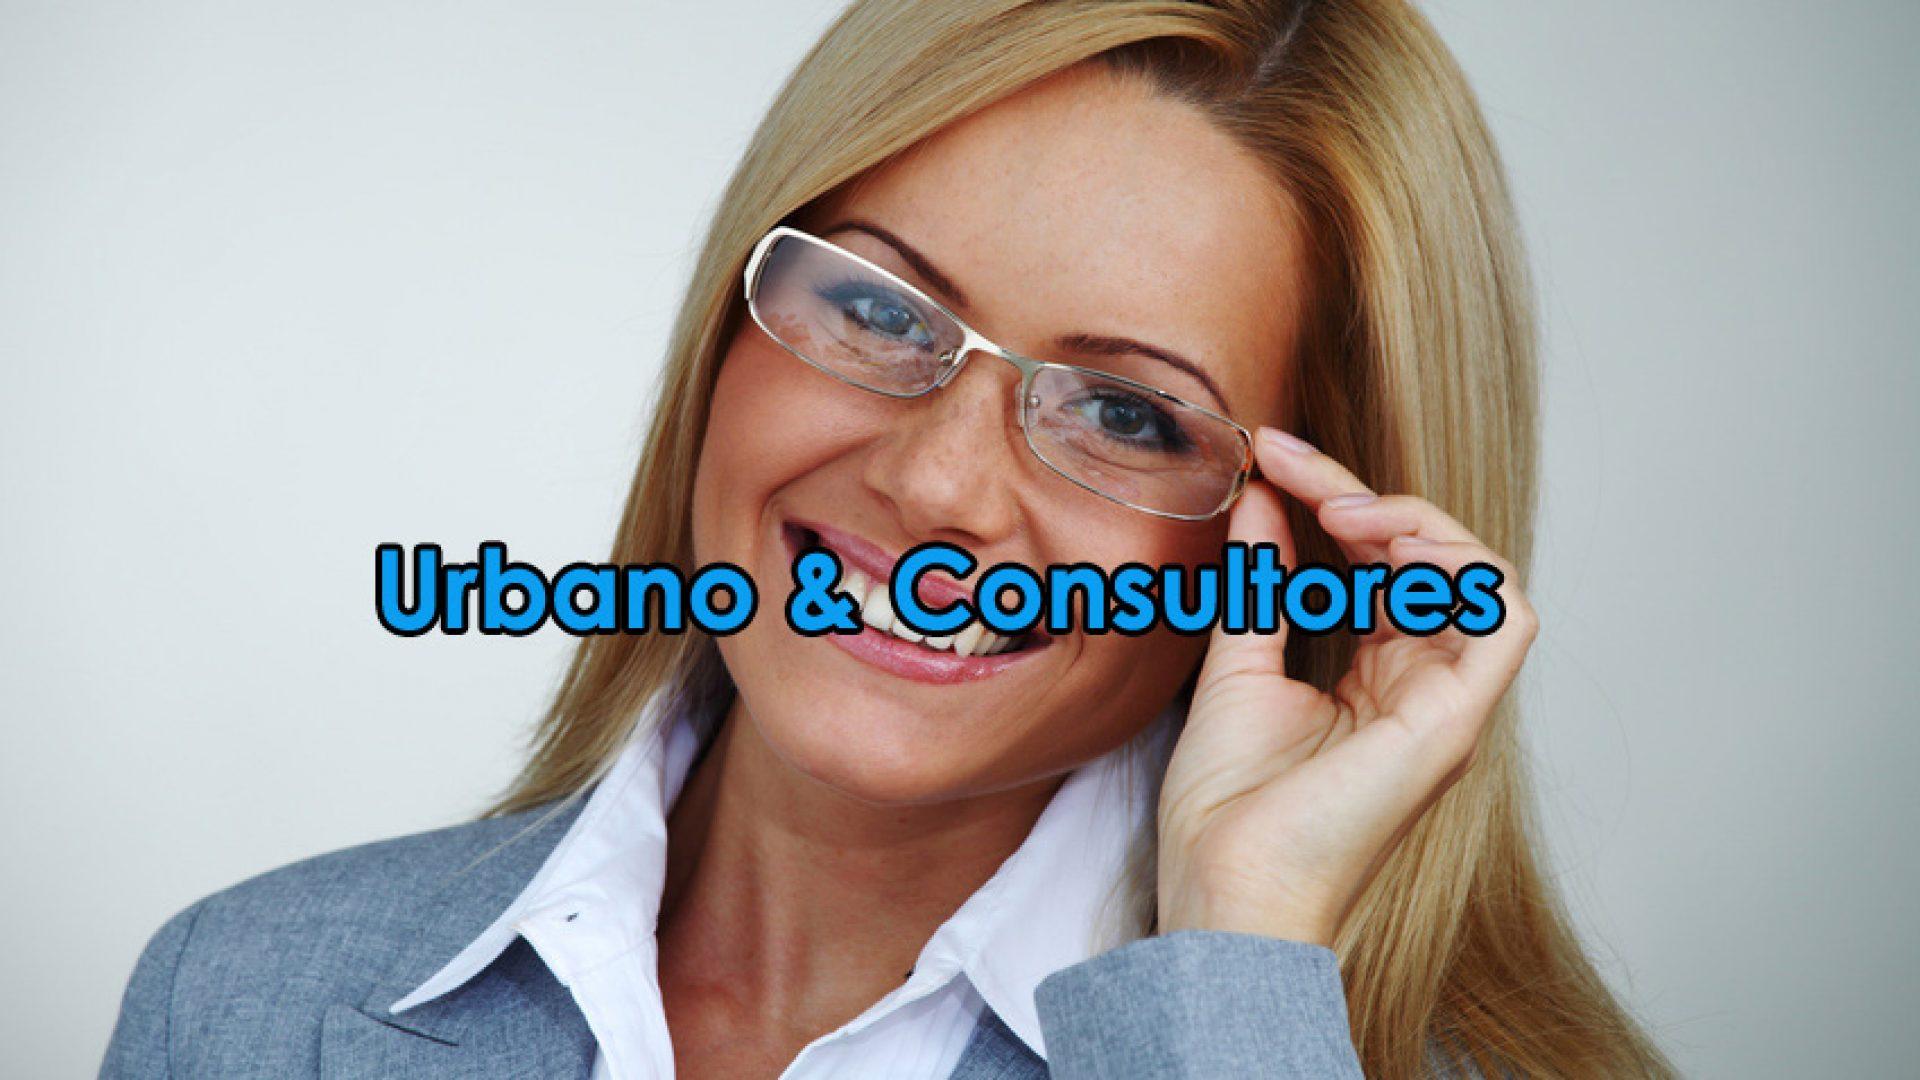 Urbano & Consultores